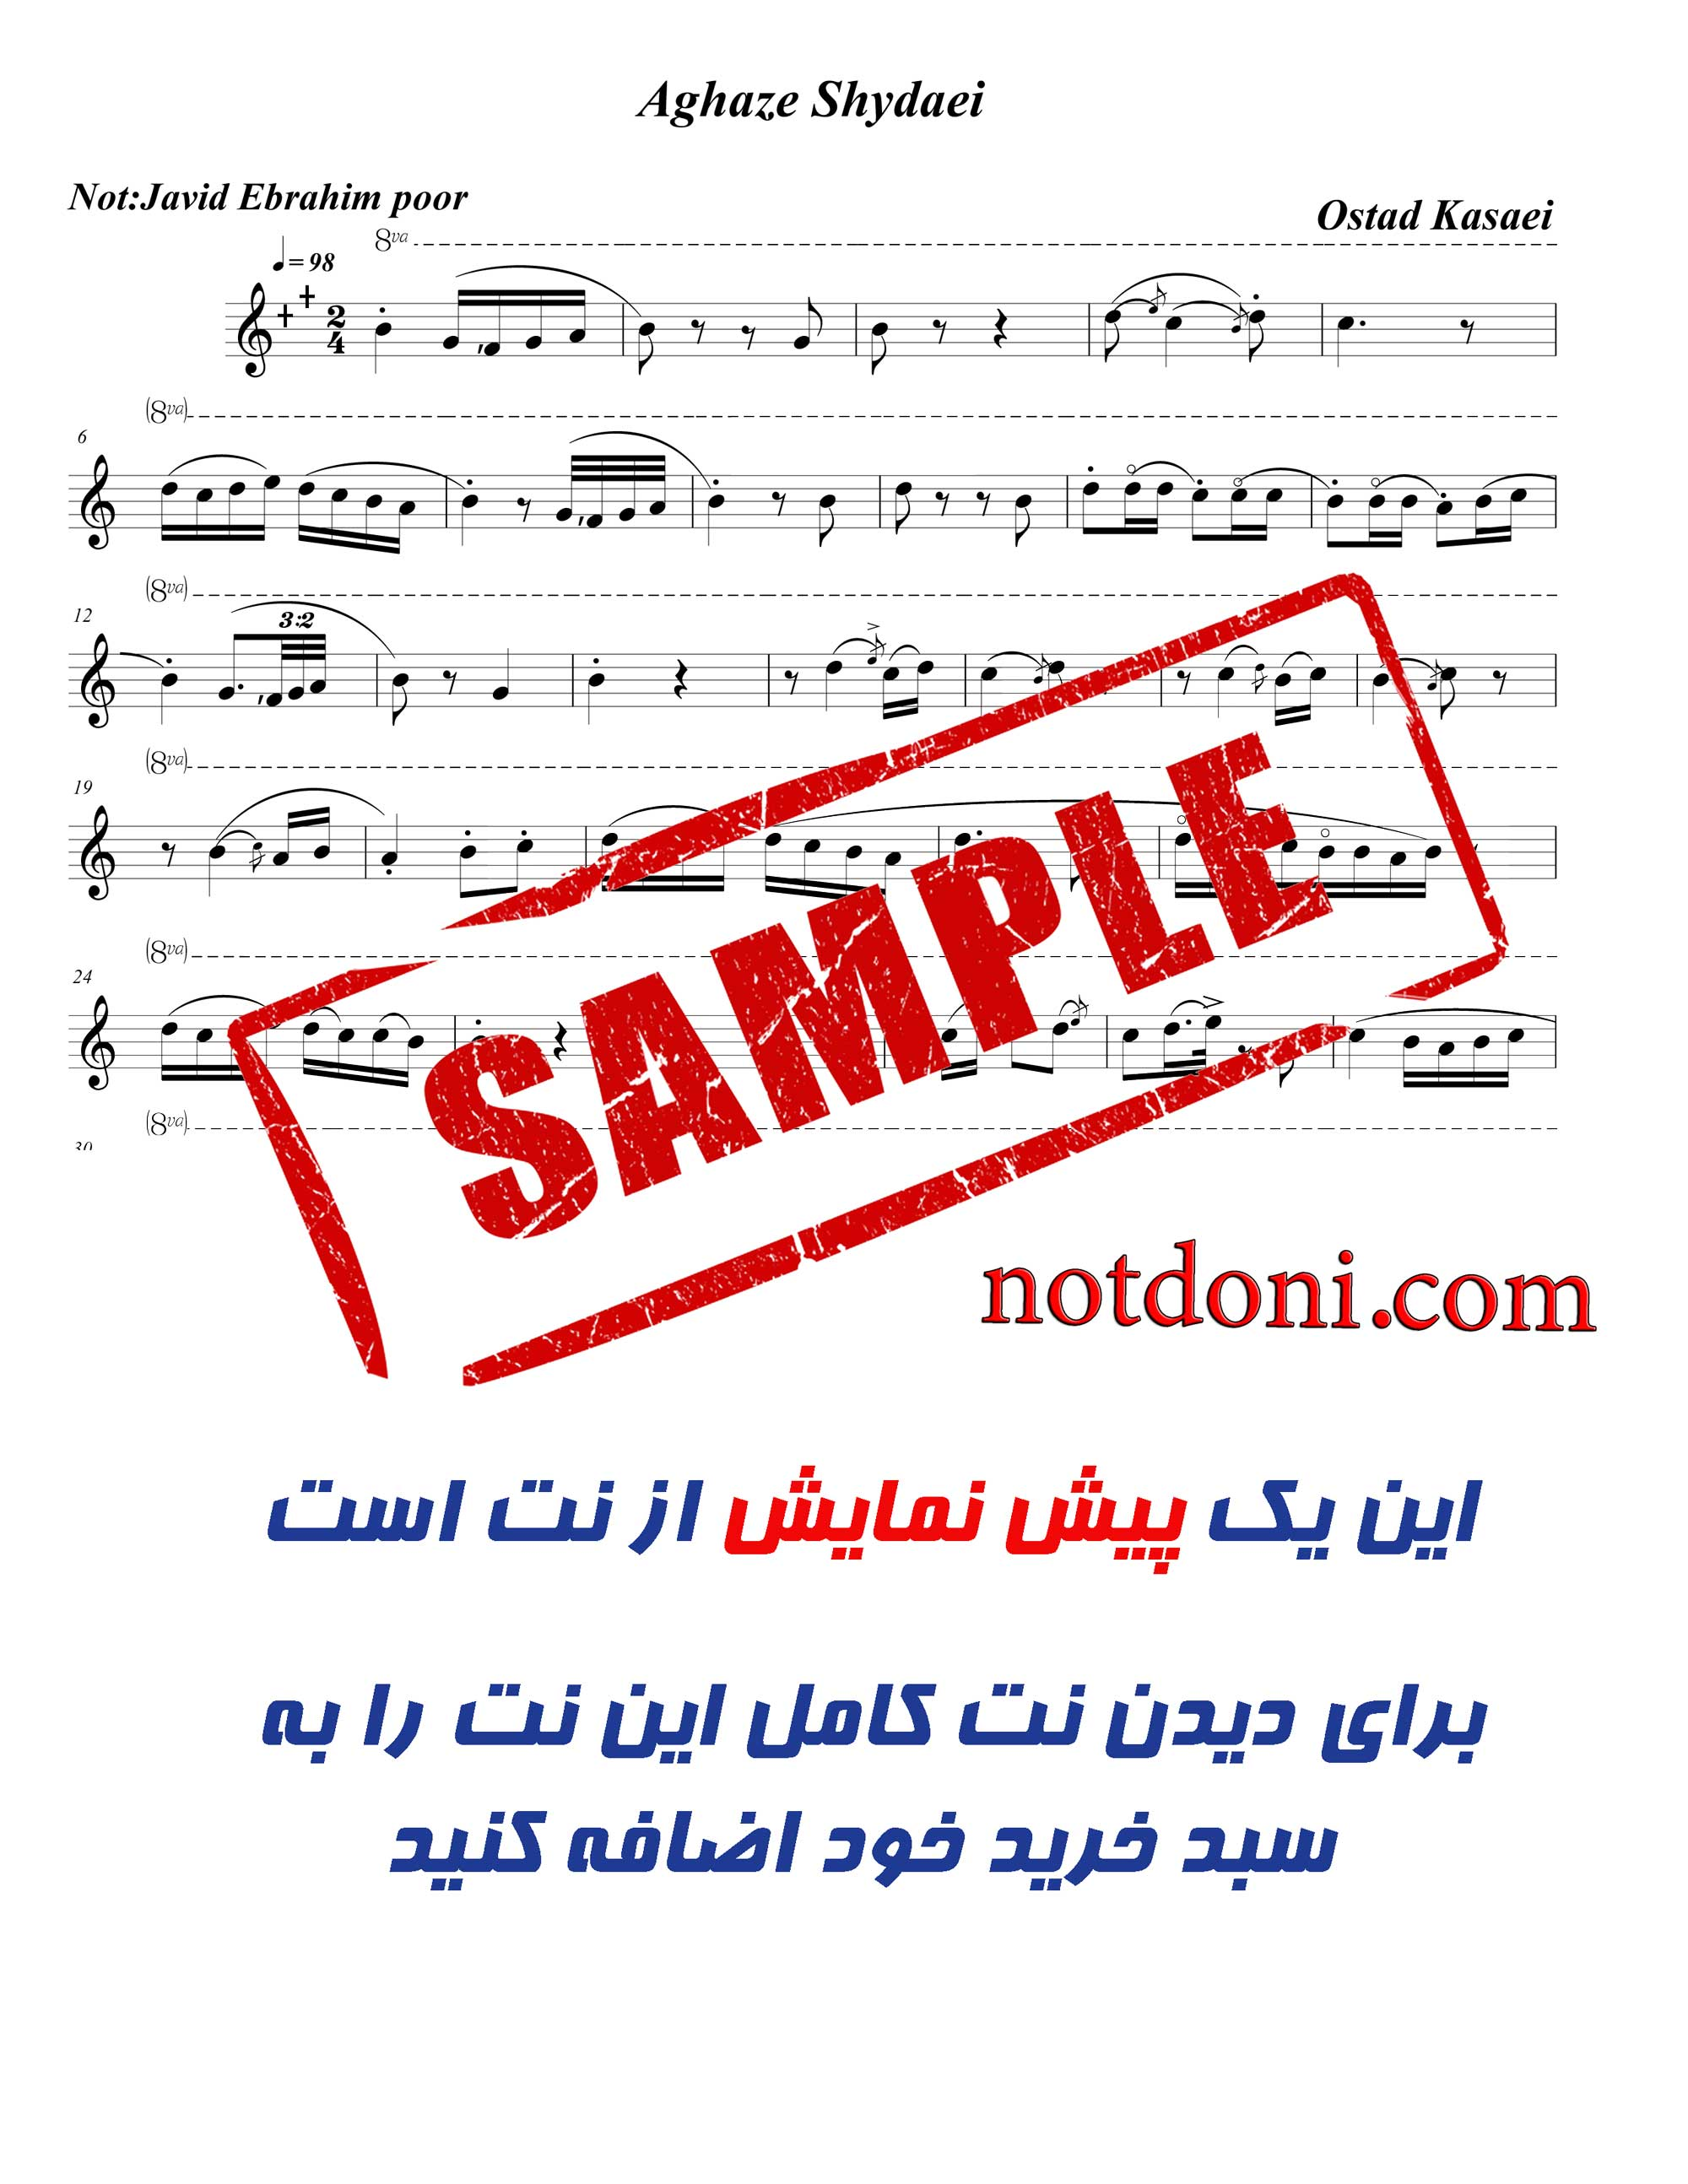 879d9088-876e-4464-a17b-9f6fd0f00bf3_دمو.jpg